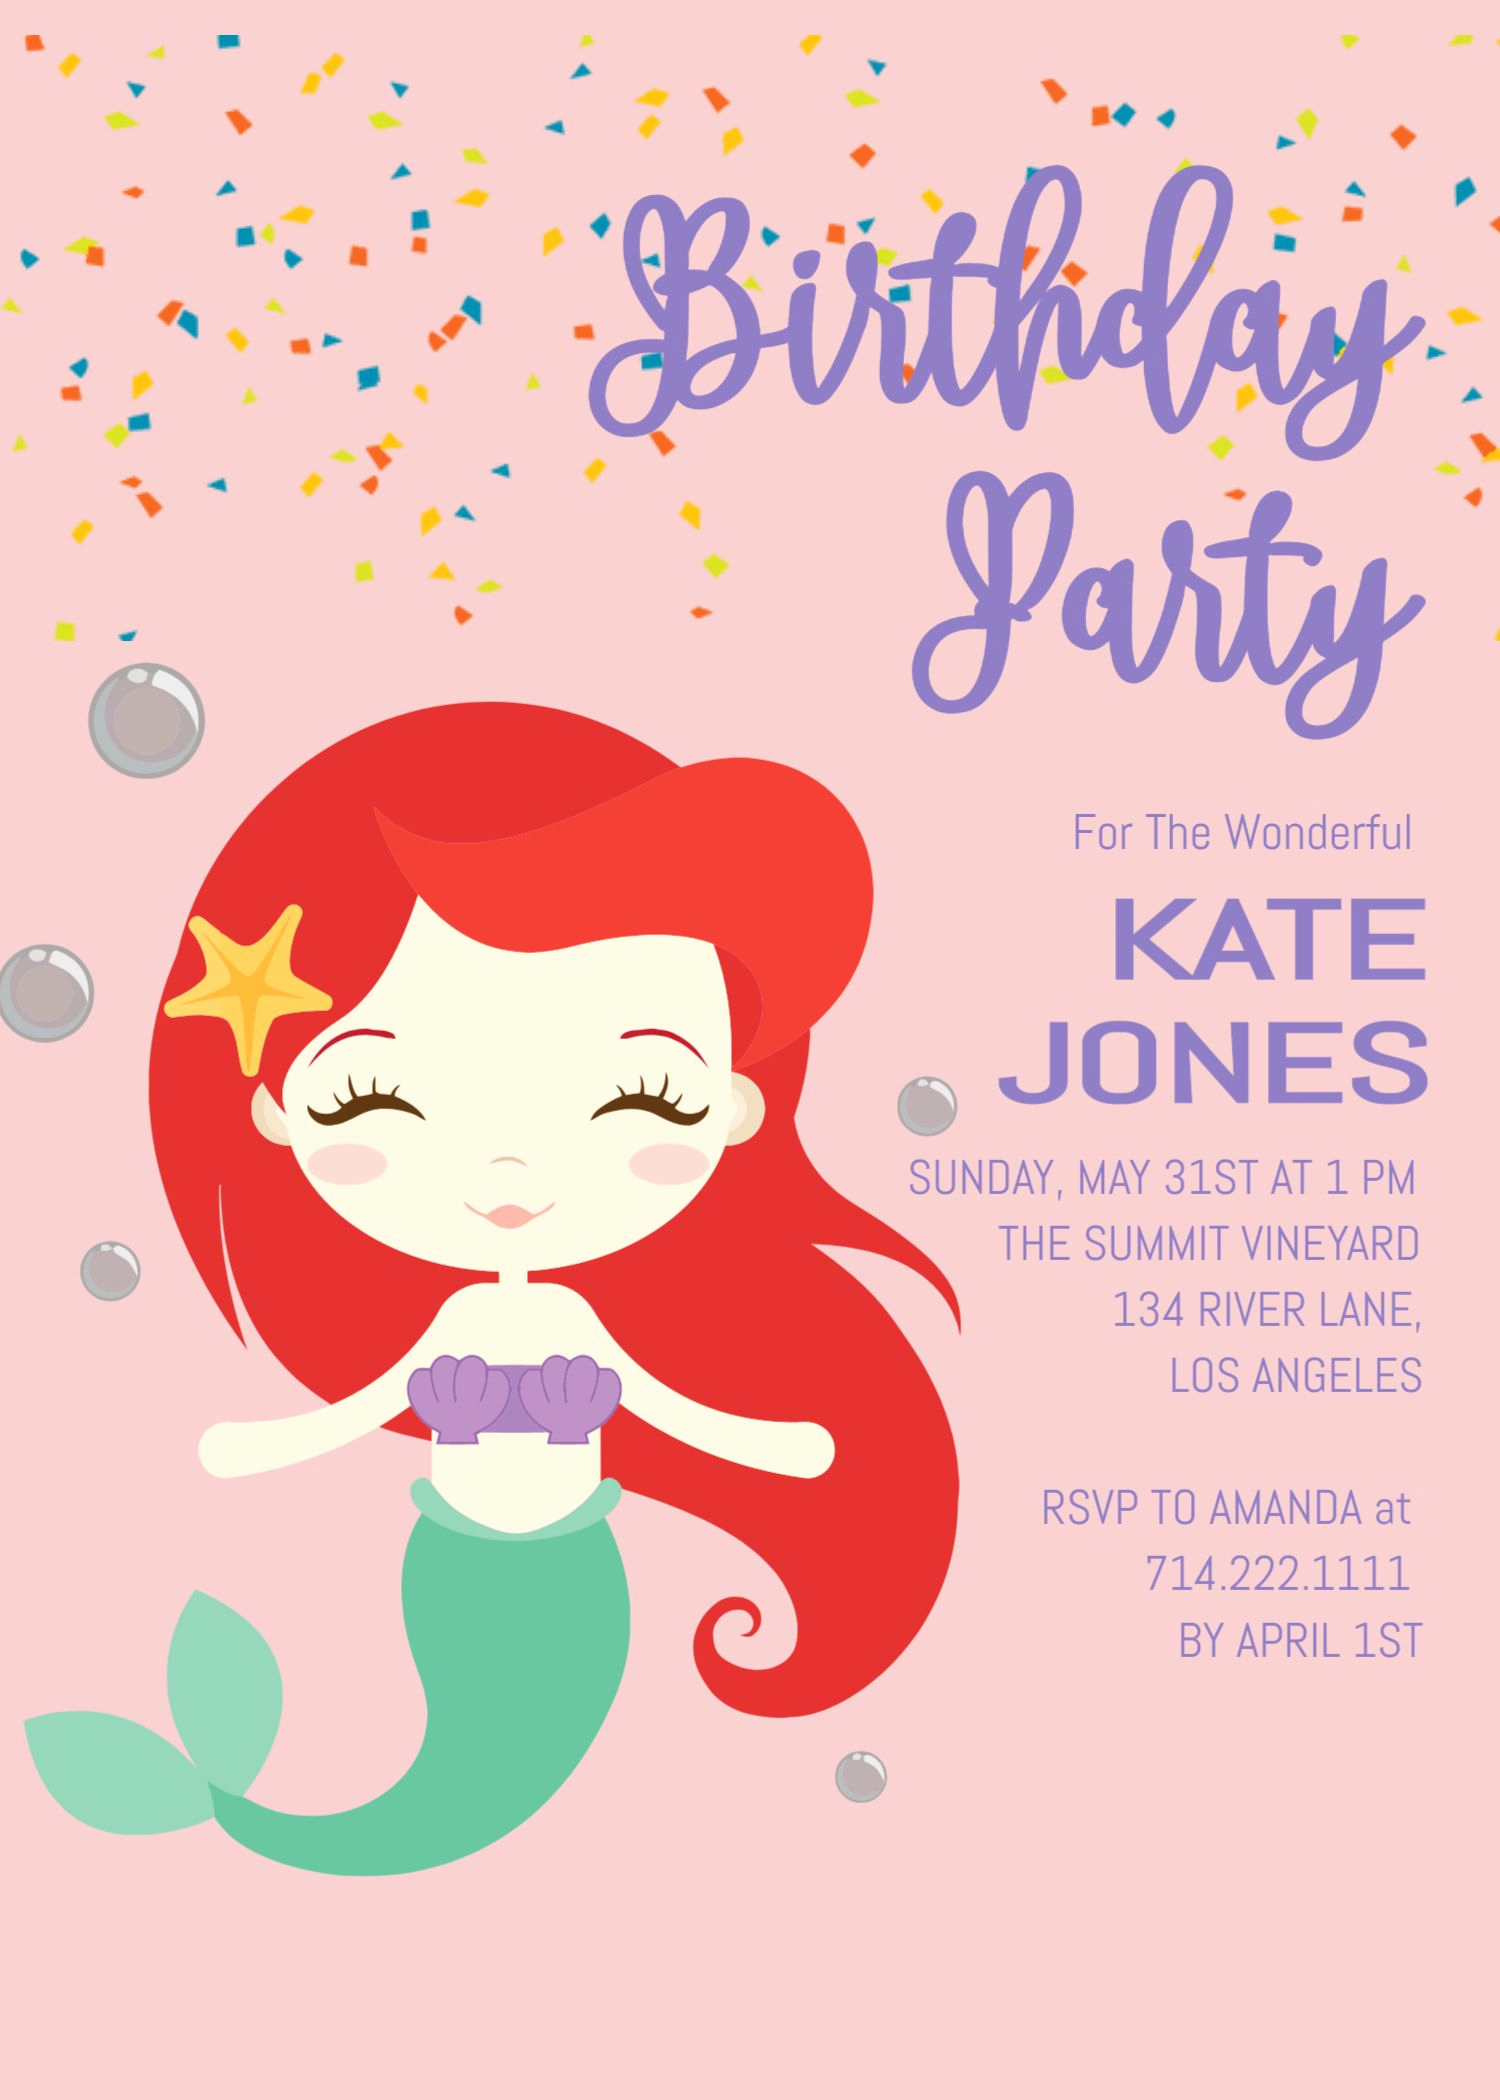 Mermaid Birthday Invitation Templates New Little Mermaid Birthday Invitation Invite Under the Sea